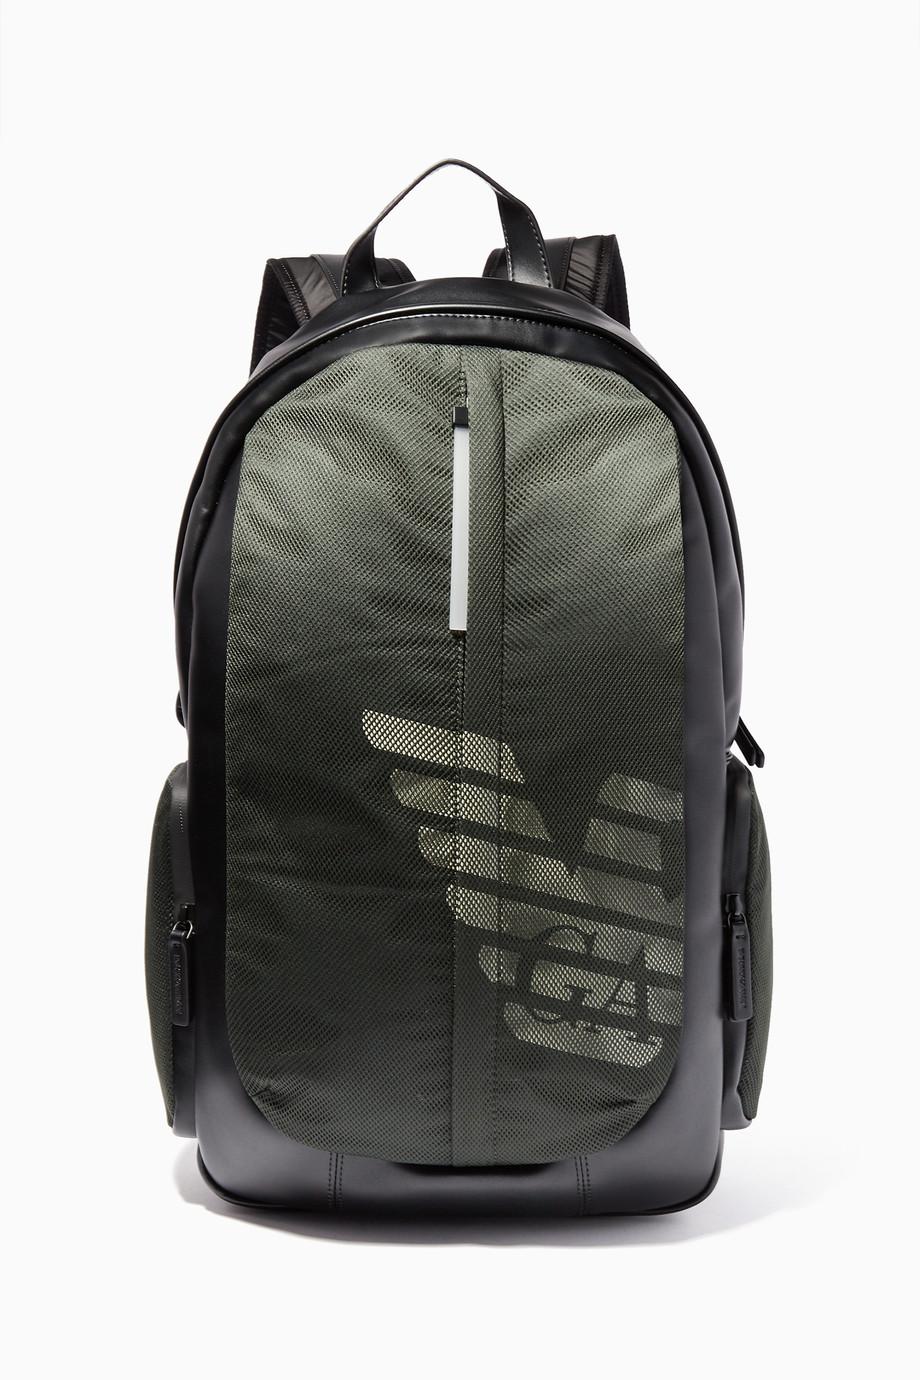 b9a5d636cc952 تسوق حقيبة ظهر بشعار الماركة أسود وأخضر داكن امبوريو ارماني اخضر ...